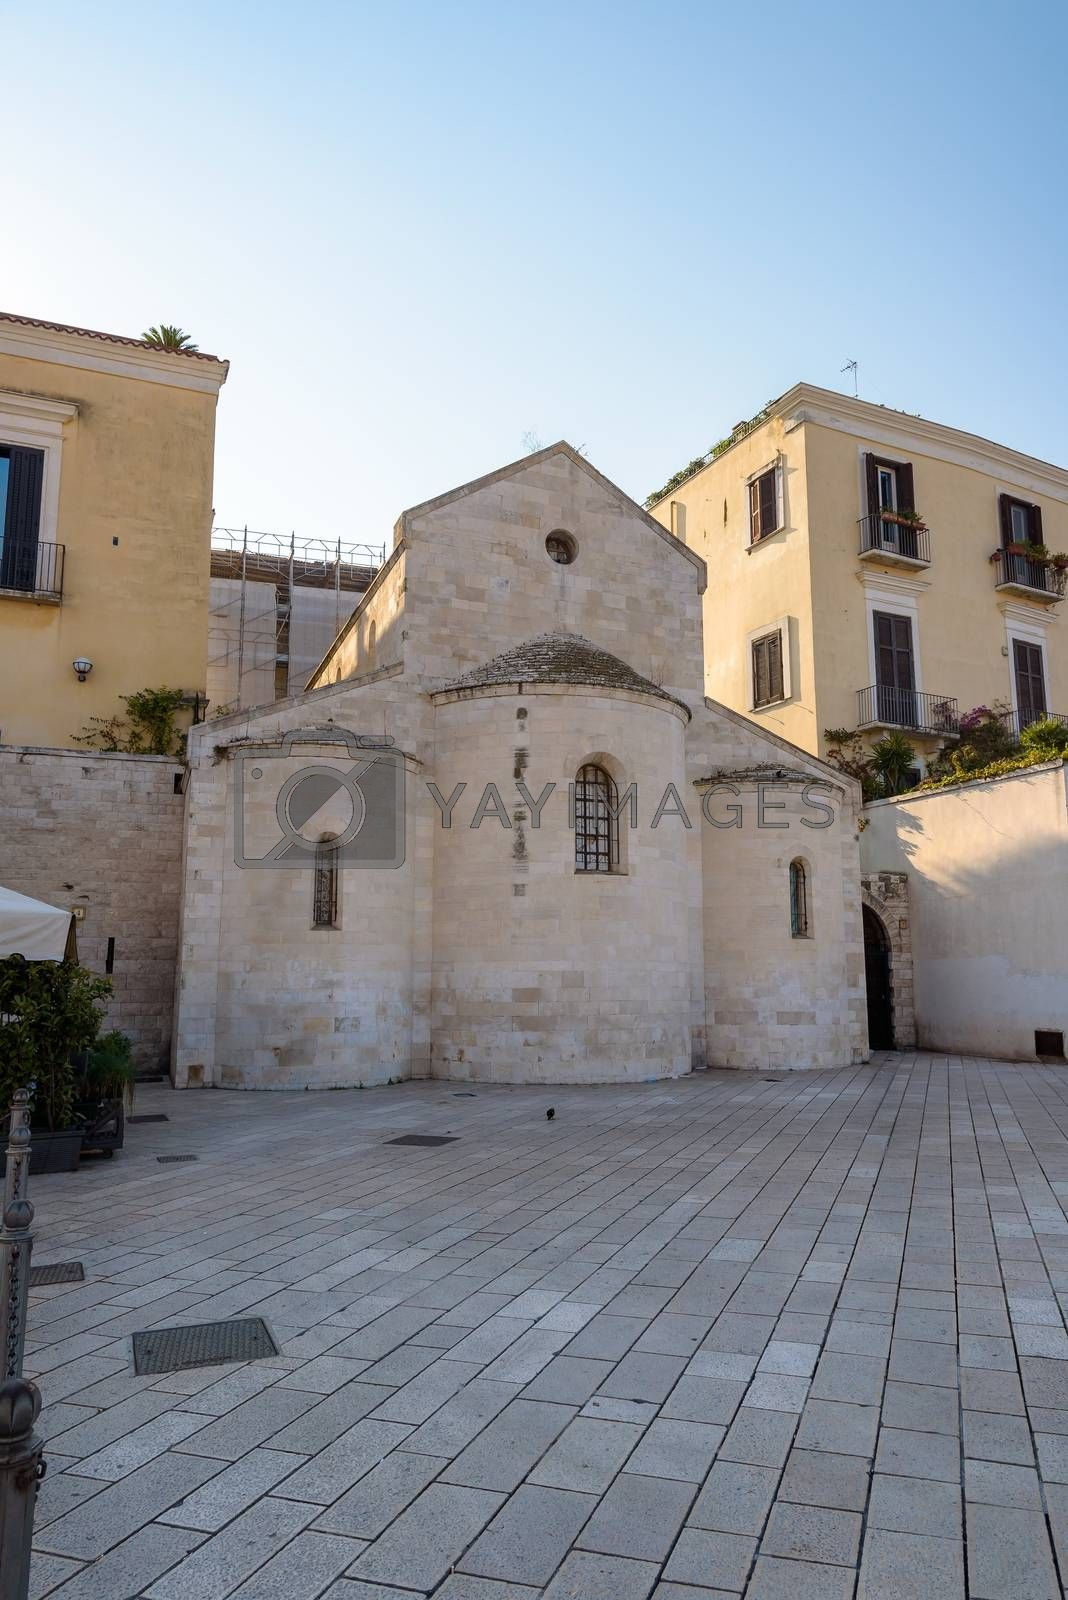 Vallisa Church building on the Ferrarese square in Bari, Apulia, Italy